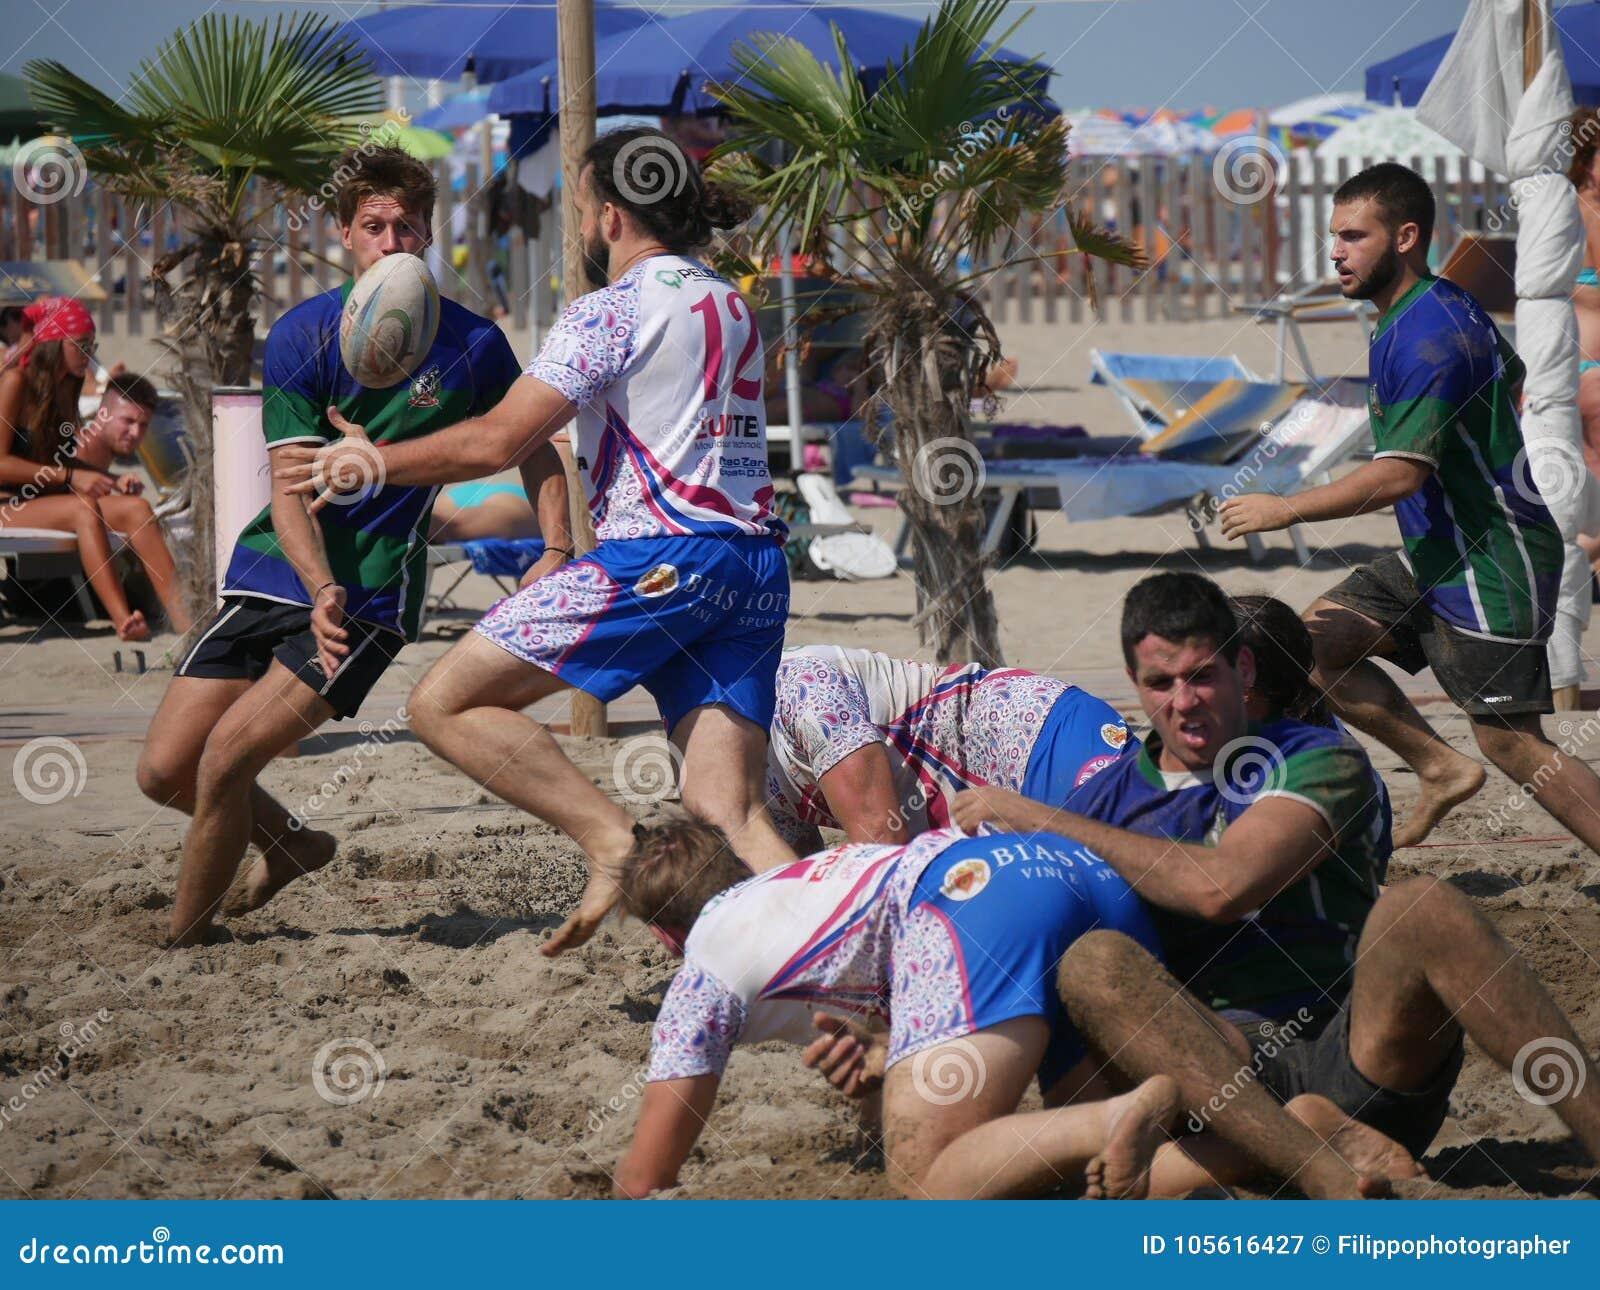 Beach rugby rosolina padova beachvs rosolina editorial